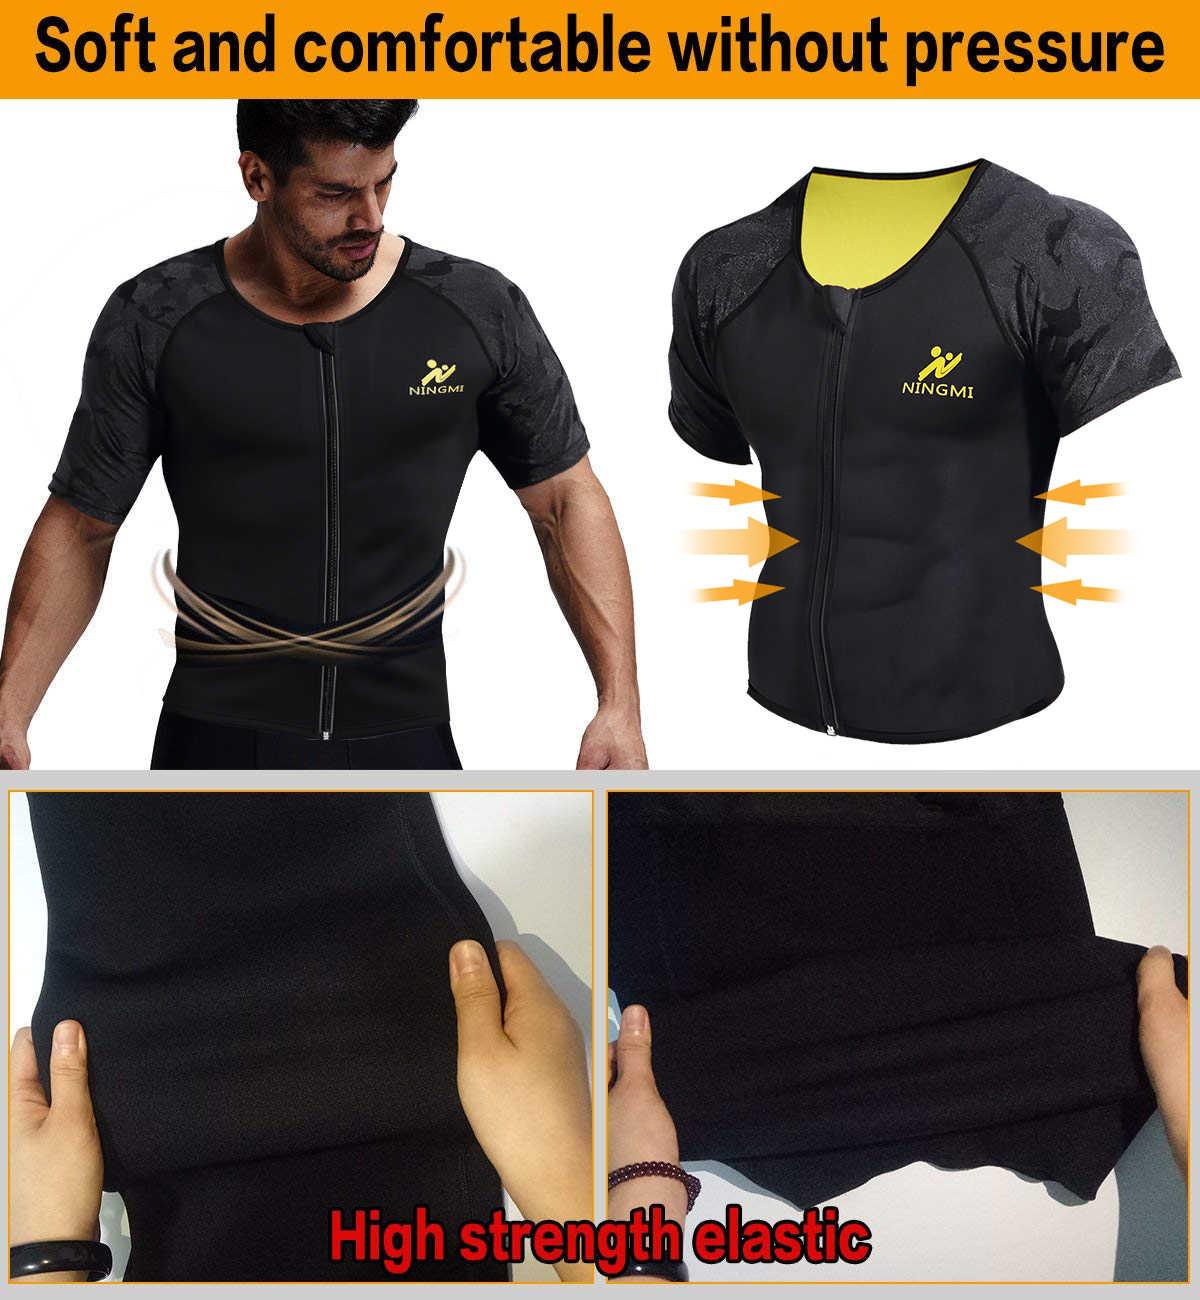 SEXYWG Sport Top Slimming Waist Trainer Neoprene Sauna Vest Weight Loss Body Shaper Yoga Shirt with Zip Mesh Tank Top Shapewear